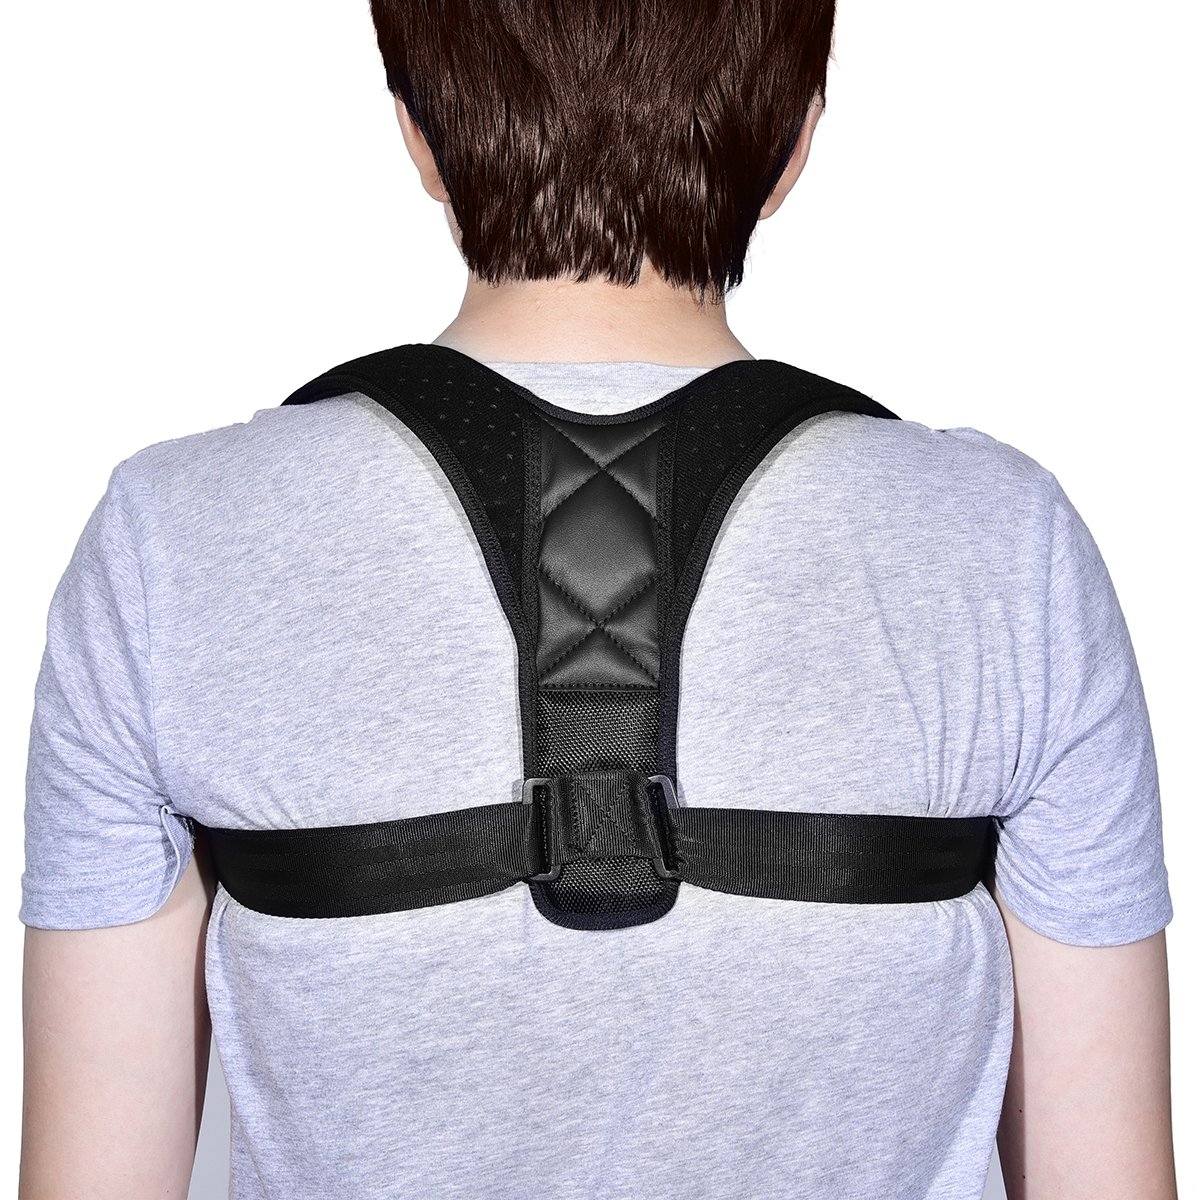 Back Posture Corrector Adjustable Clavicle Brace Comfortable Correct Shoulder Posture Support Strap Improve Posture Correction Computer Sitting Work Prevents Slouching for Women Men, 28''-48''